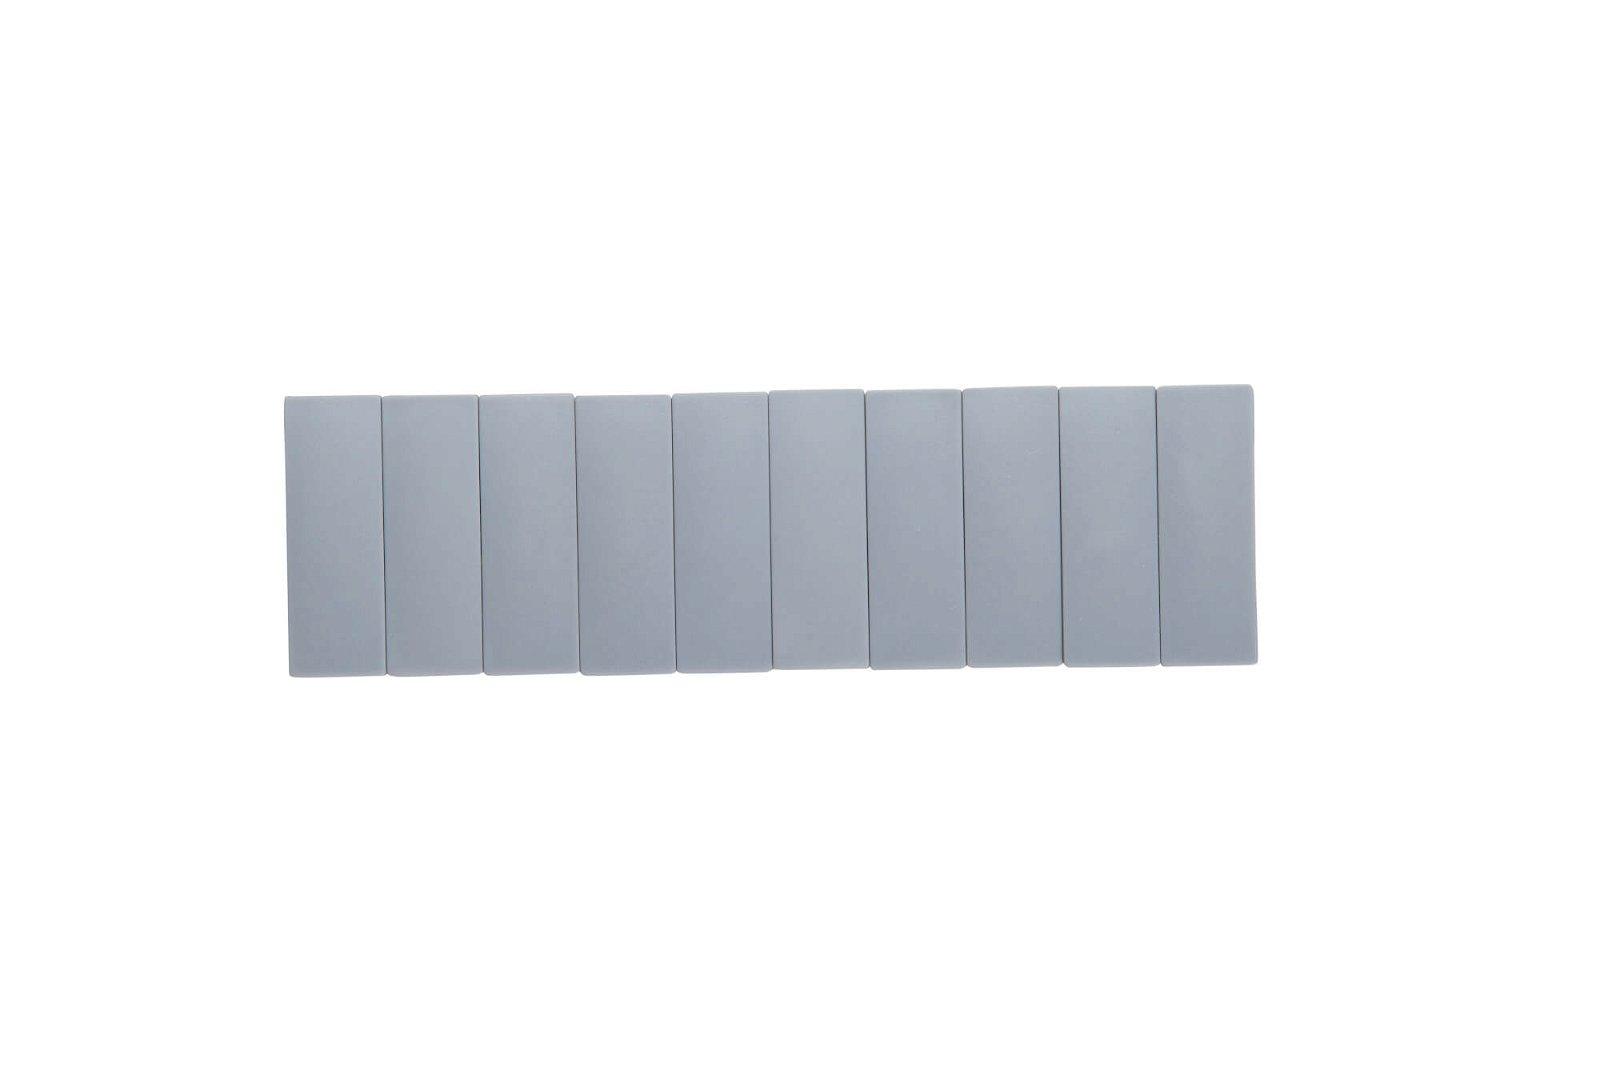 Magnet MAULsolid 54 x 19 mm, 1 kg Haftkraft, 10 St./Ktn., grau